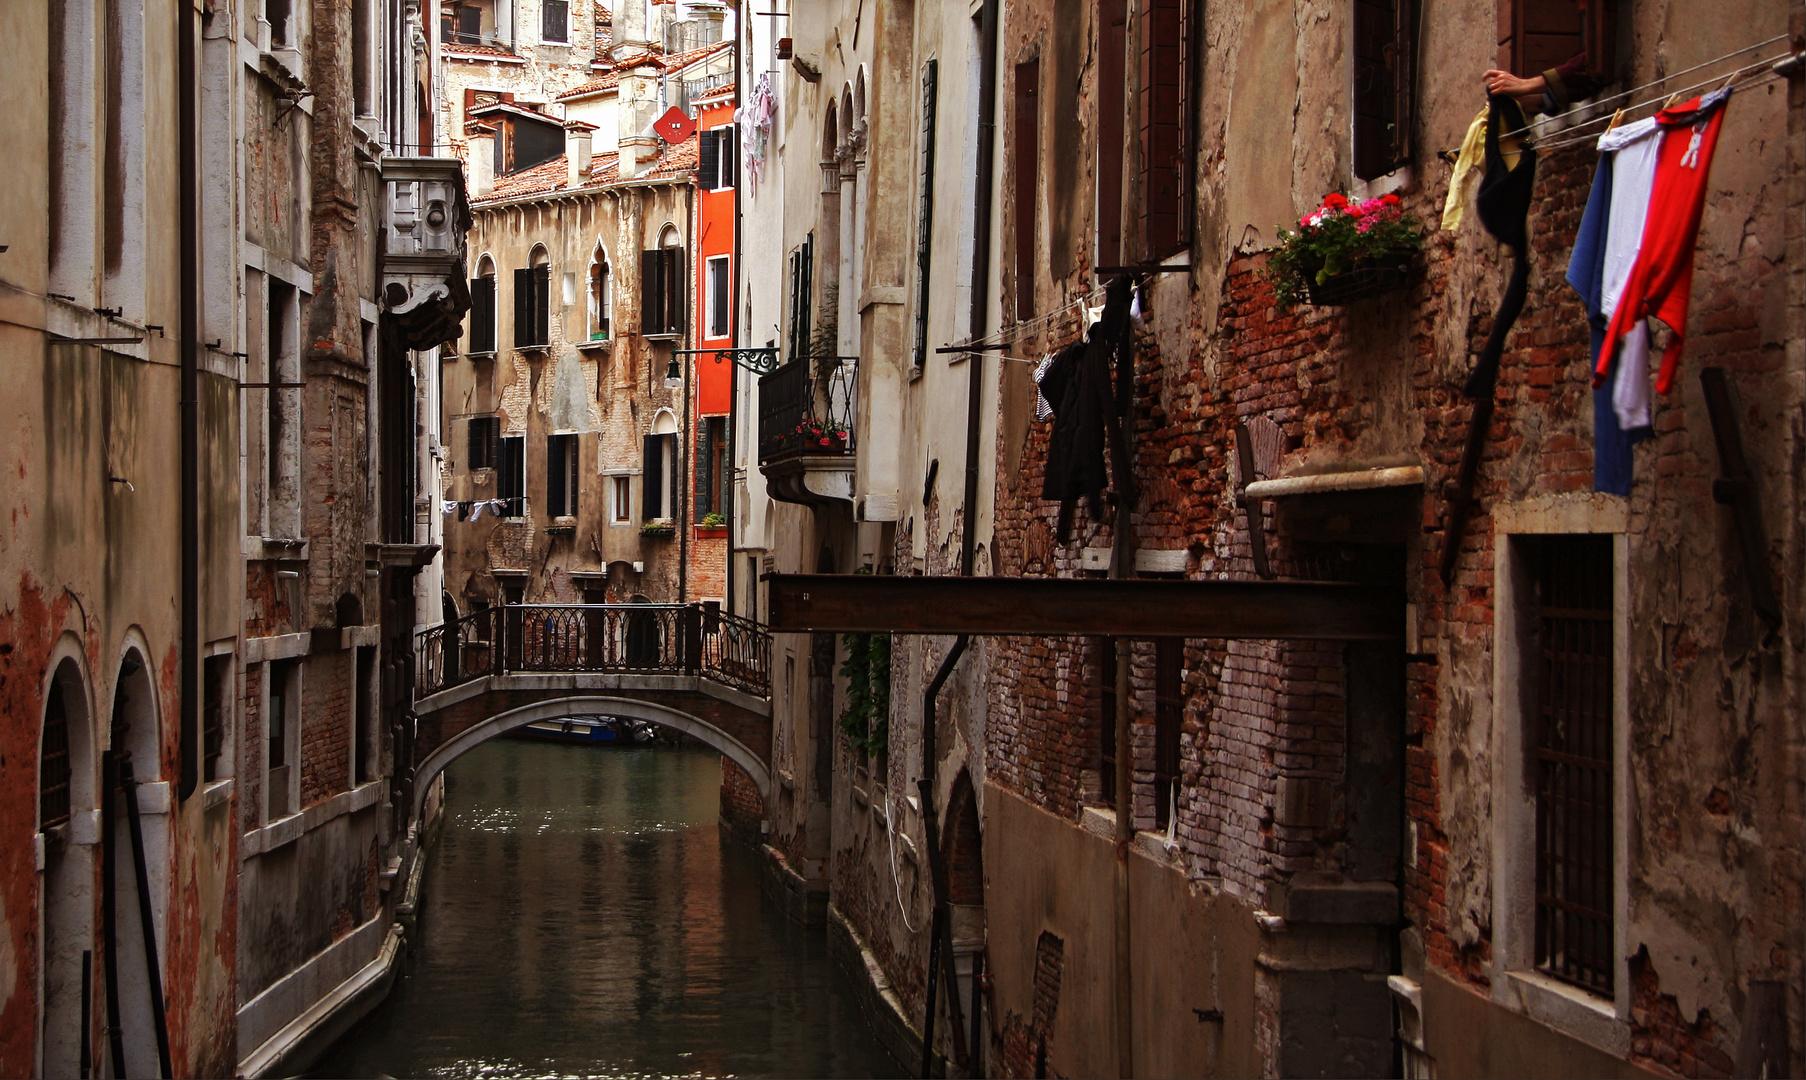 Panni sul canale